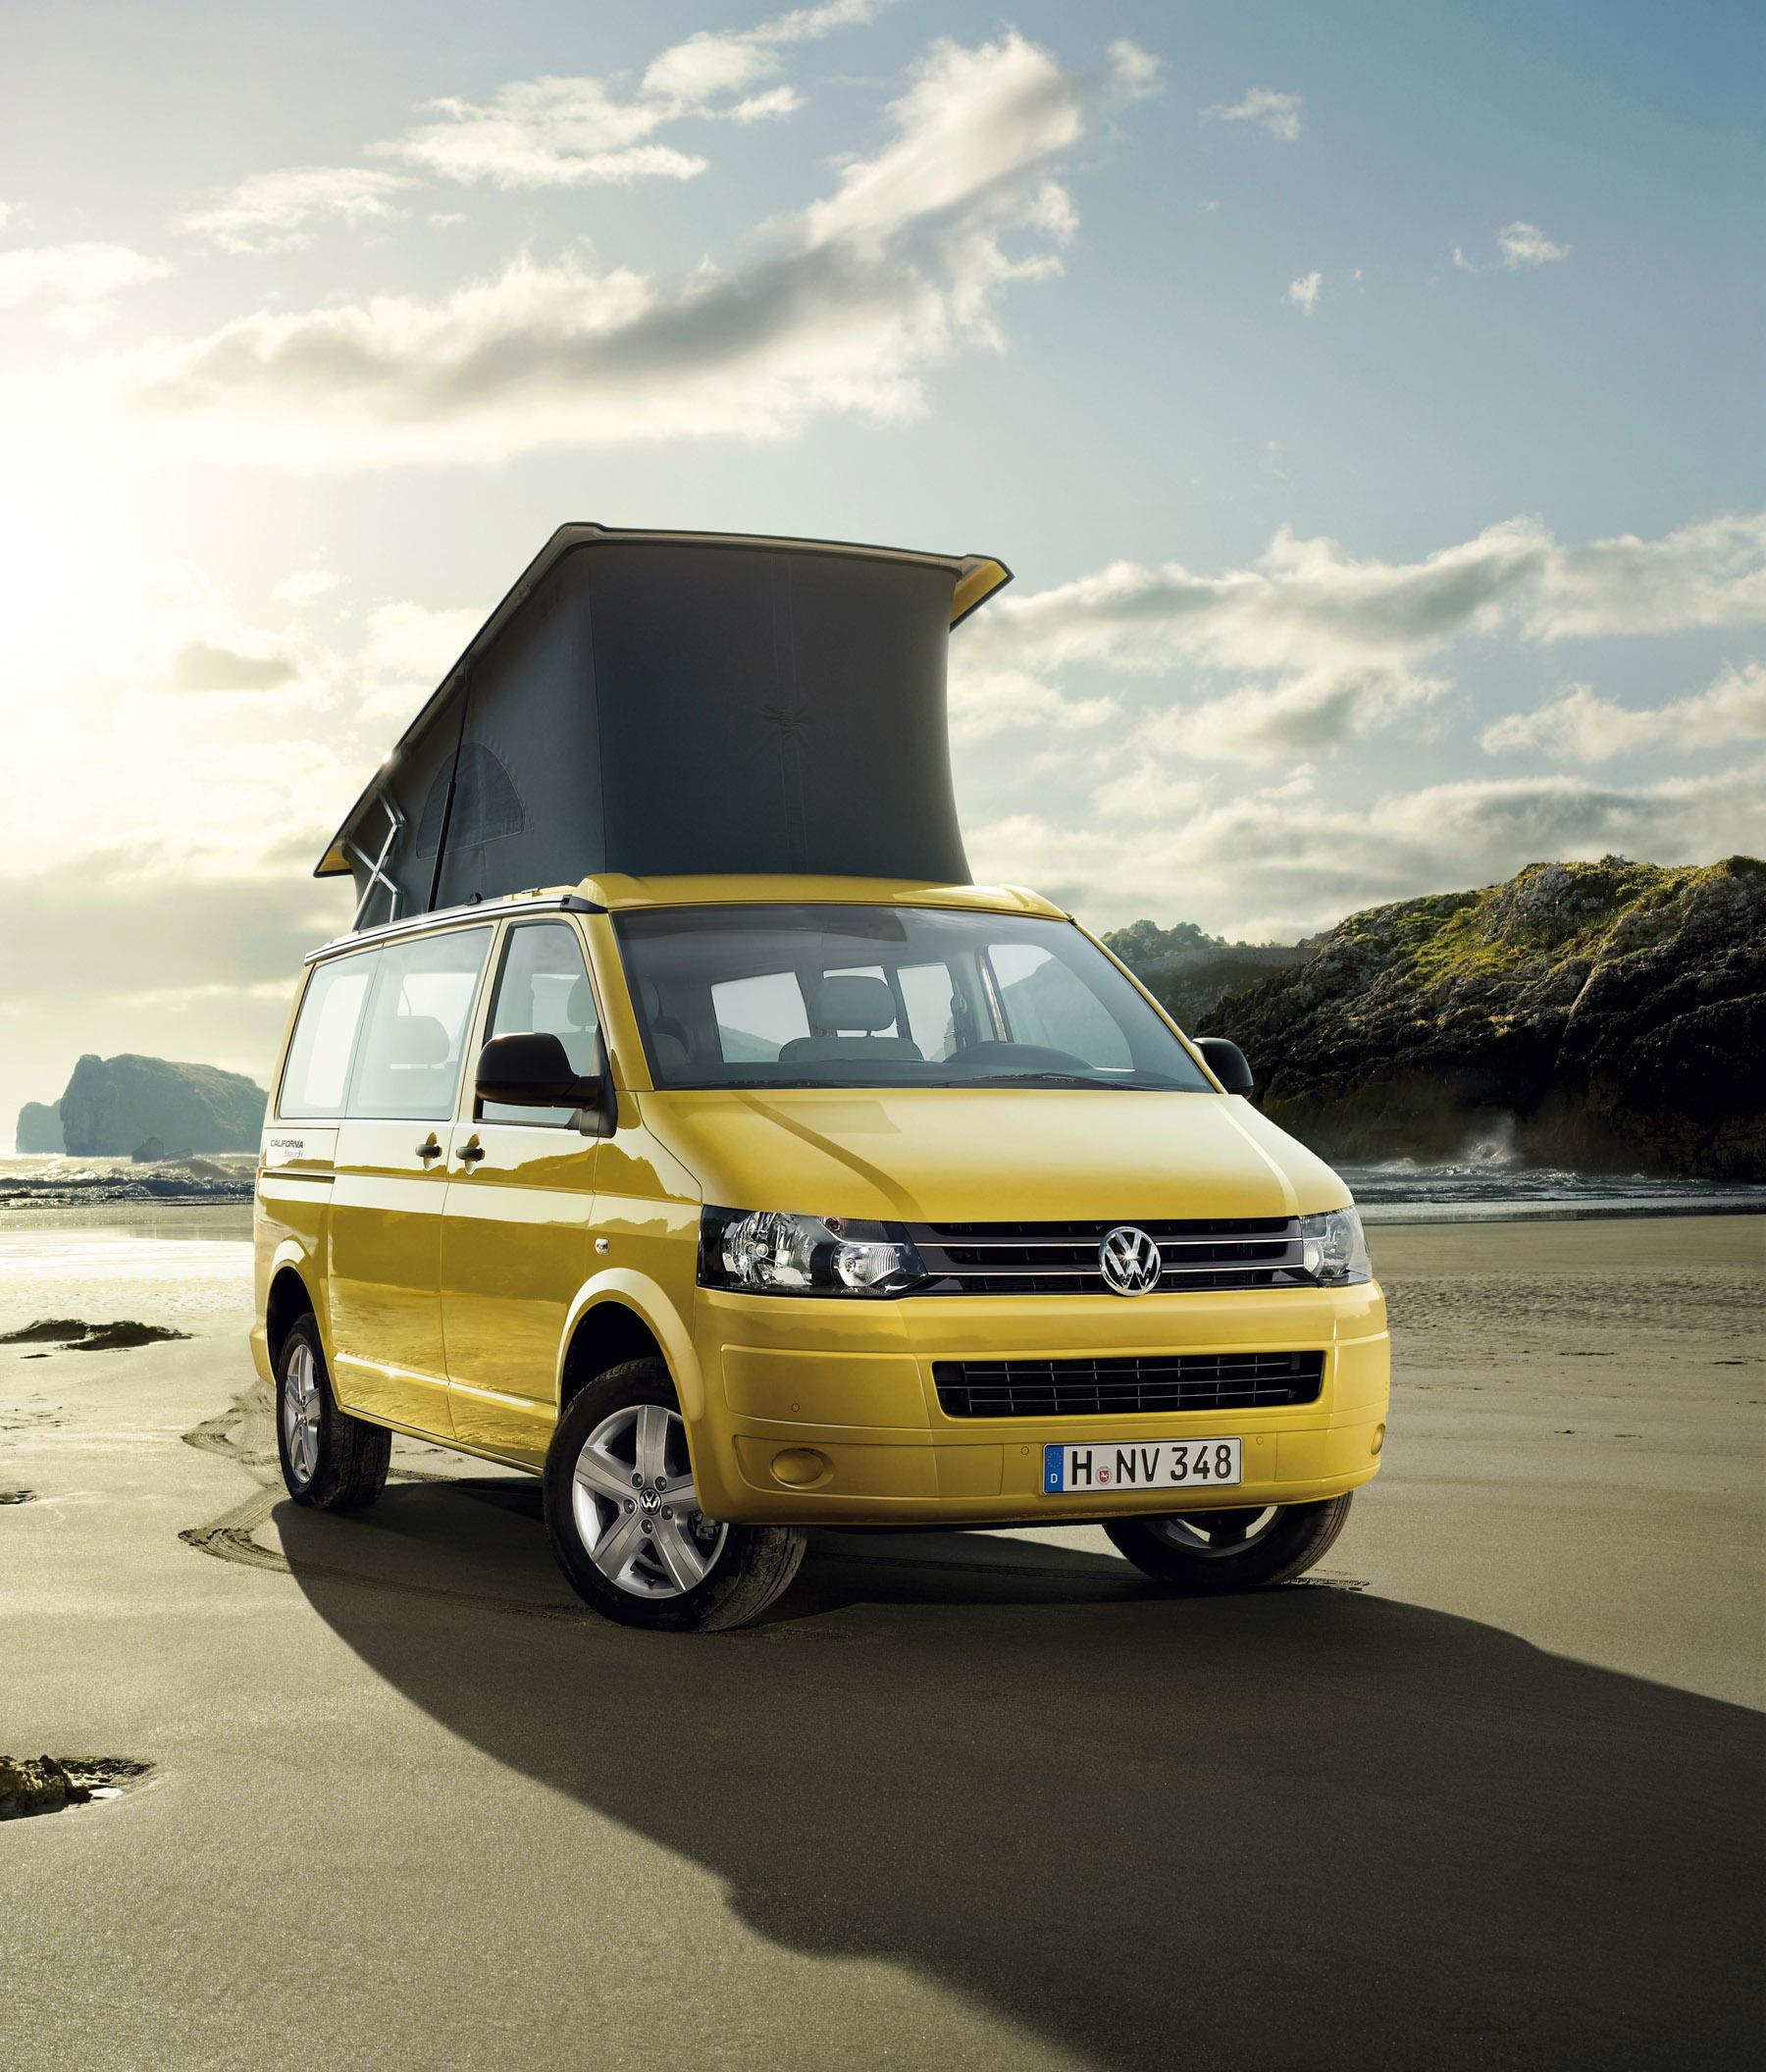 2012 volkswagen california beach price 34 970. Black Bedroom Furniture Sets. Home Design Ideas